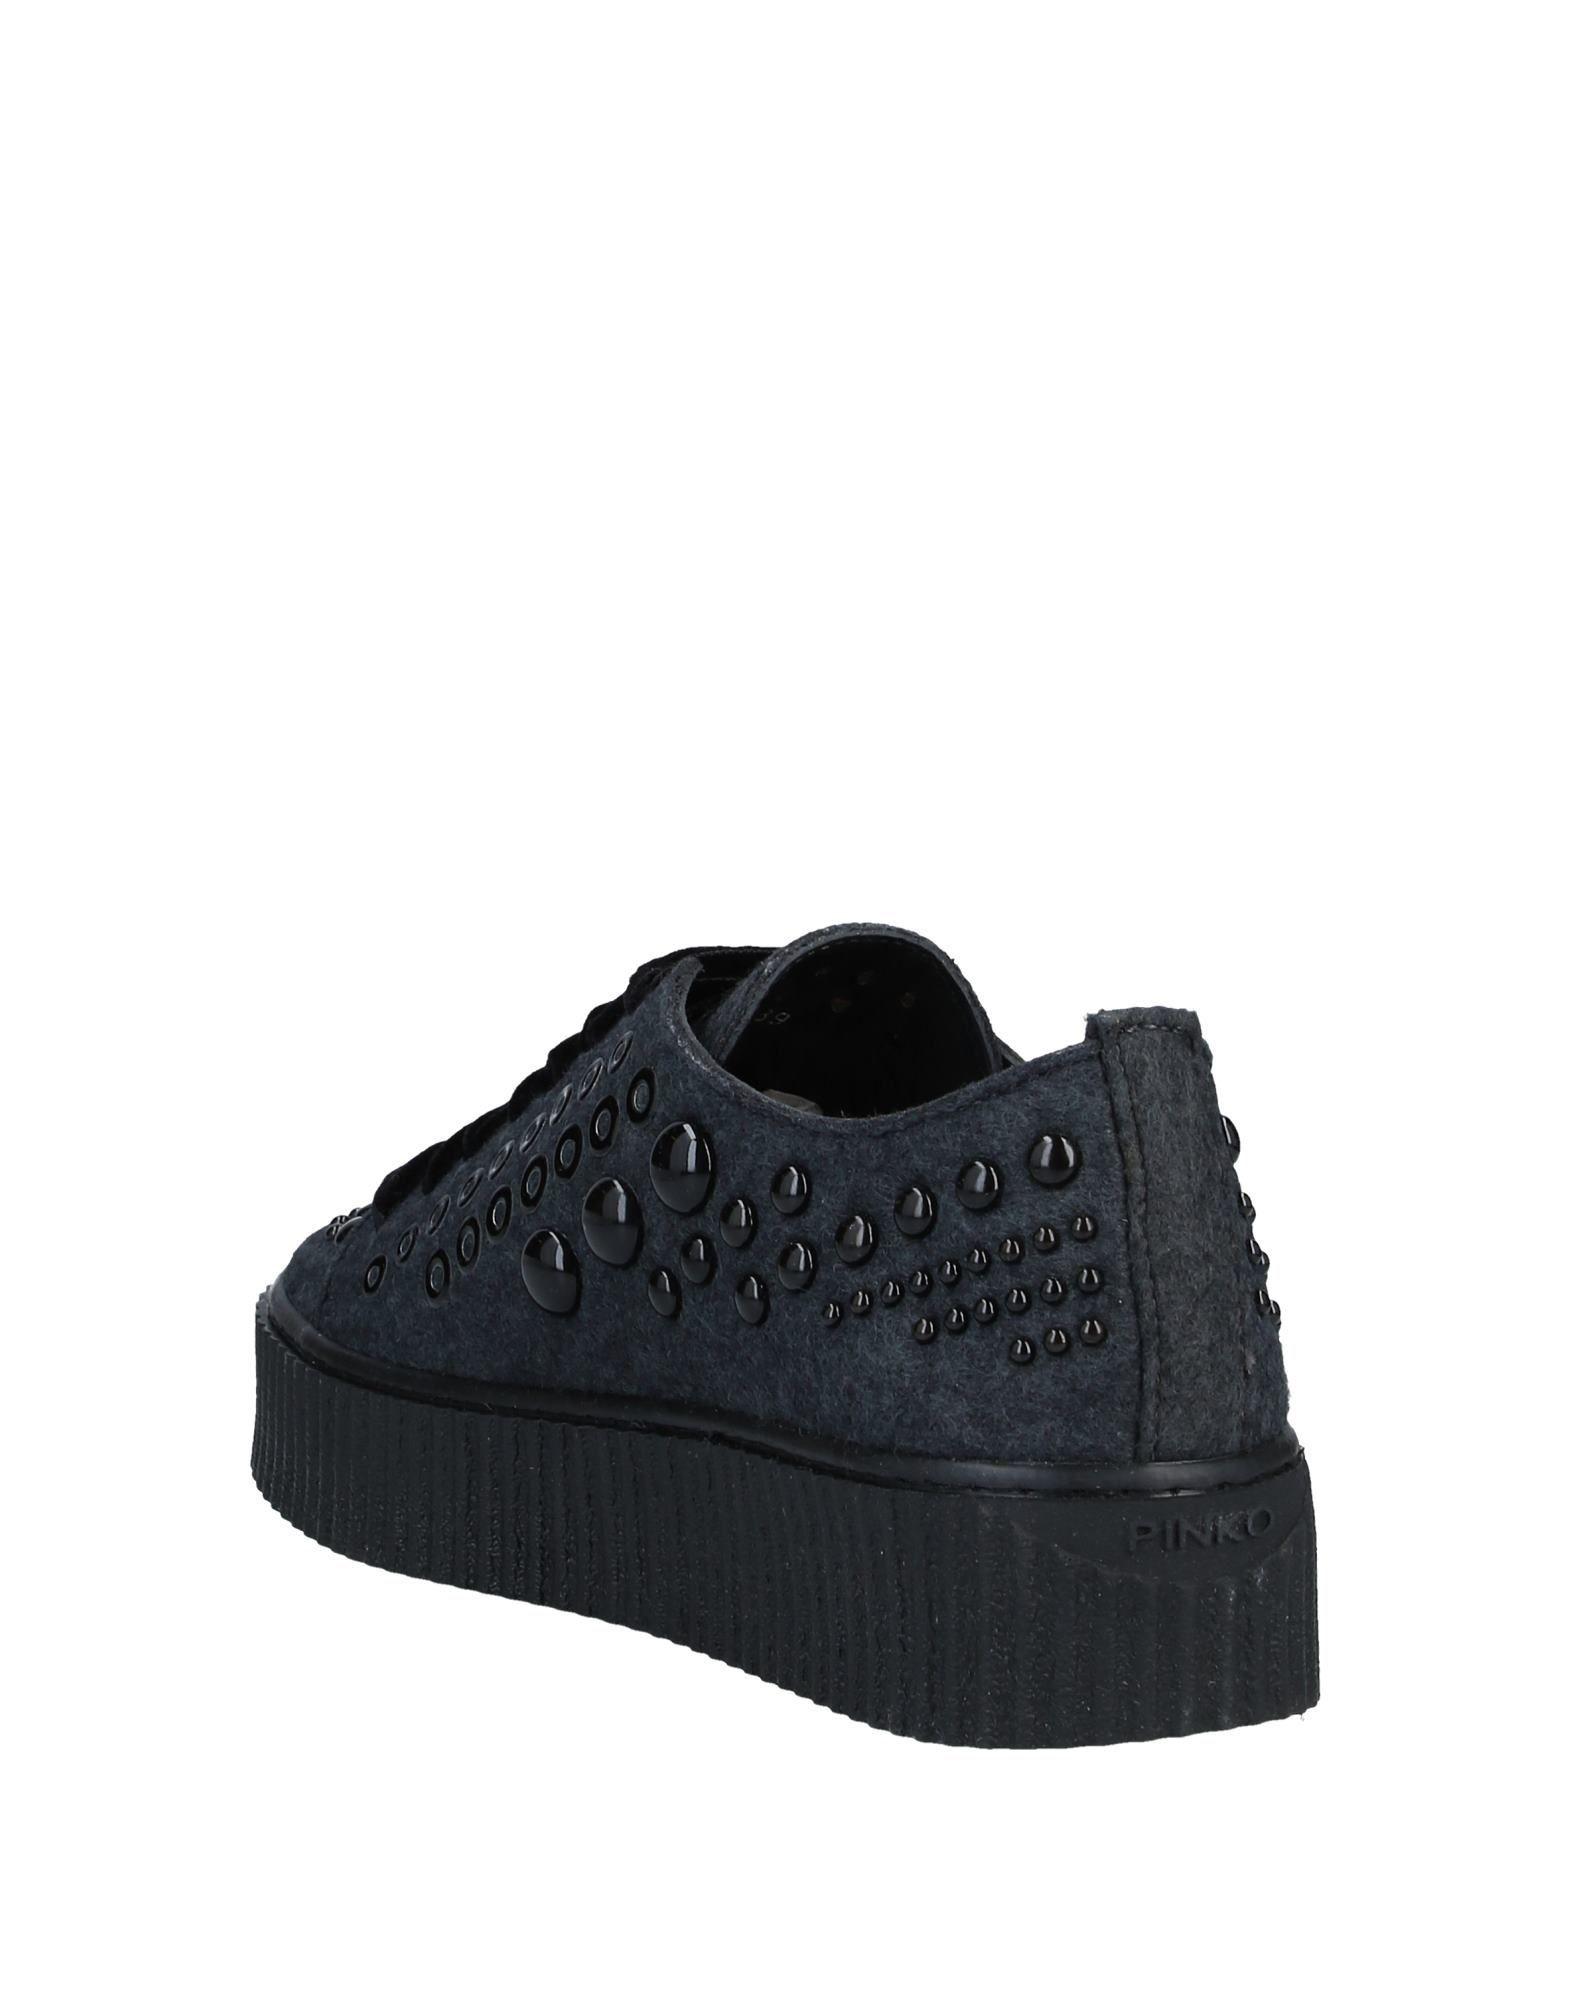 Pinko Steel Grey Studded Sneakers